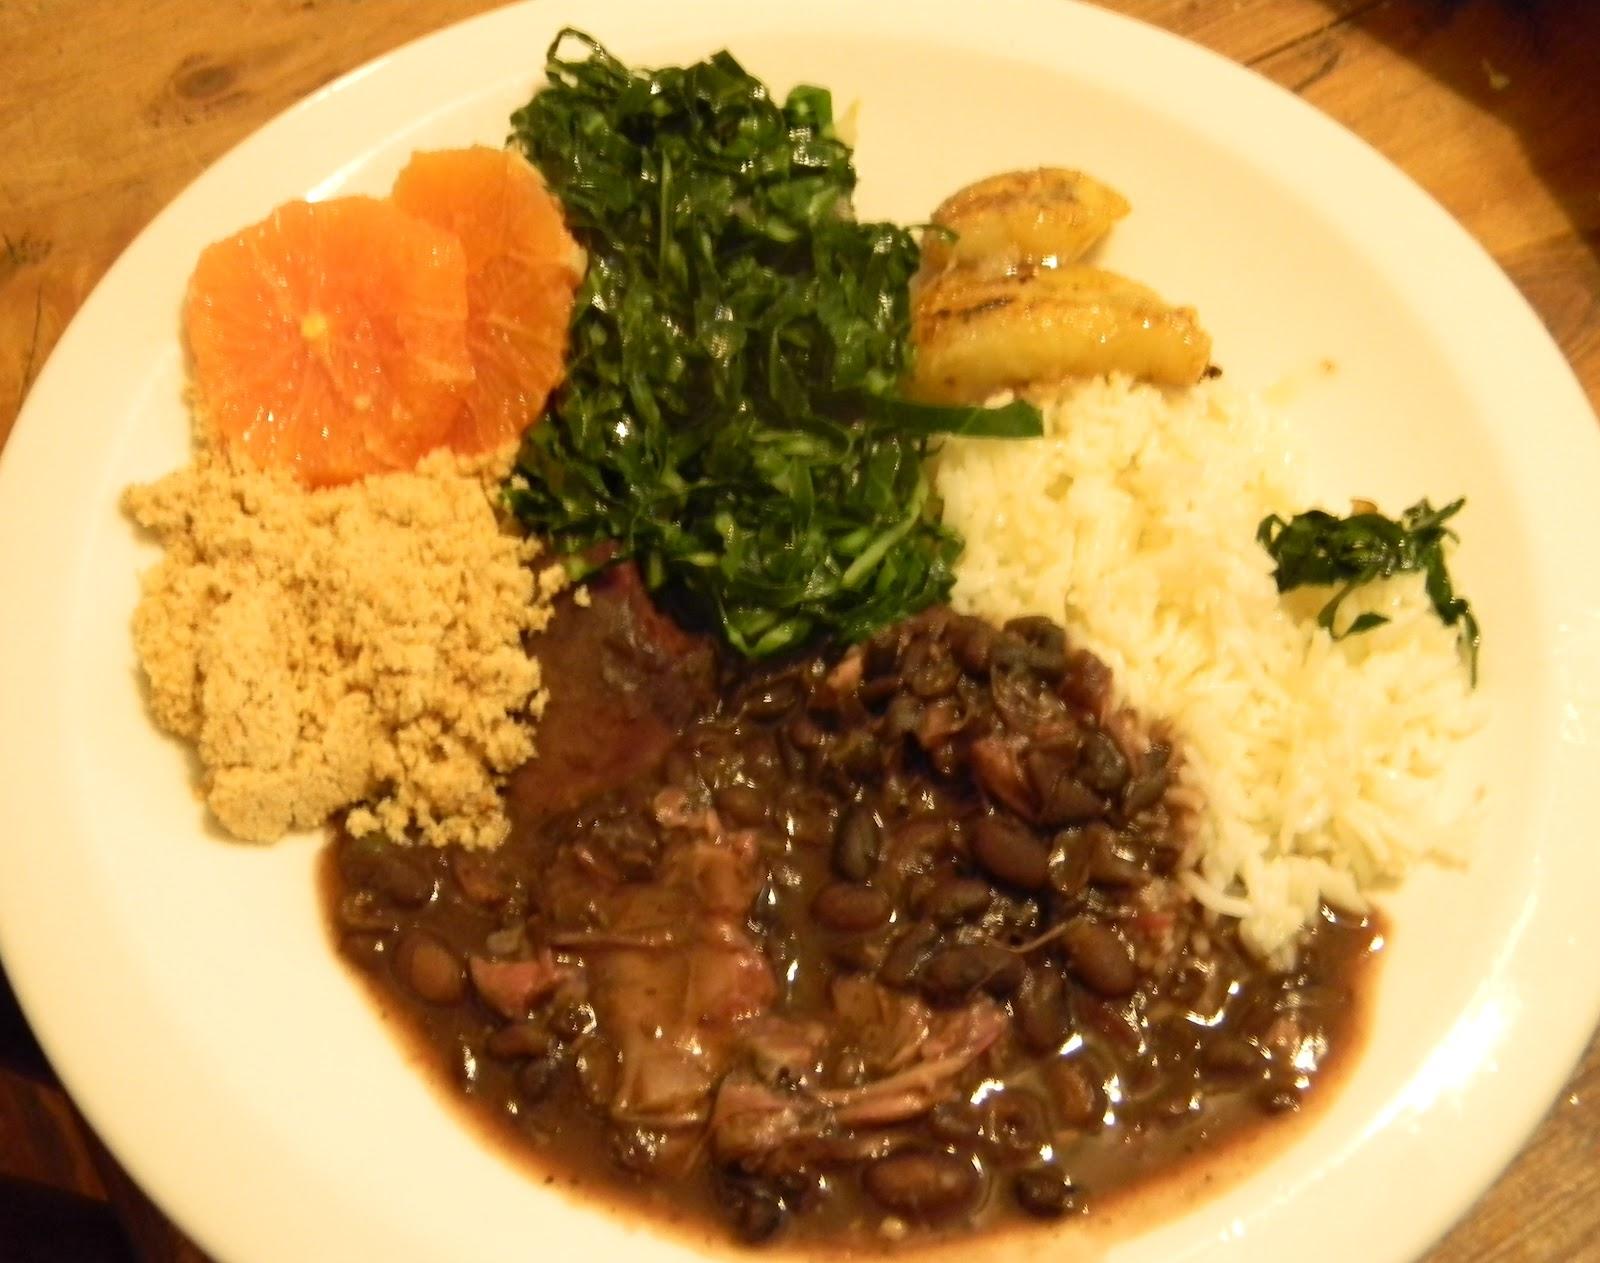 Black beans, rice, collard greens, sauteed bananas, orange slices, and ...